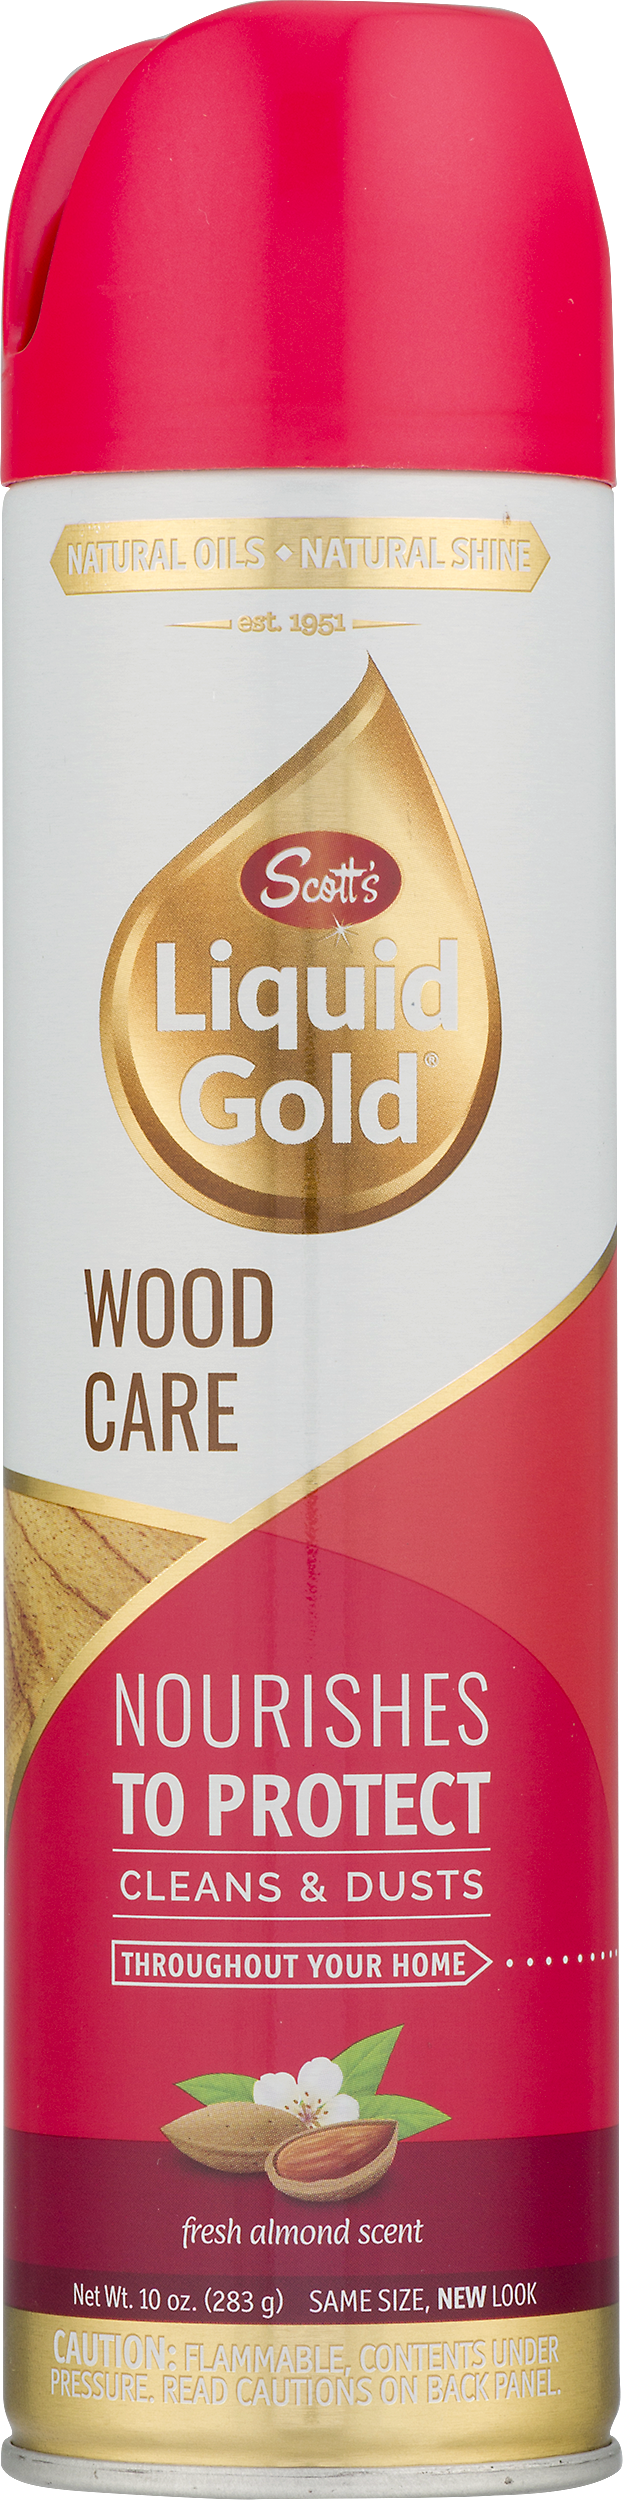 Scott S Liquid Gold Wood Care Aerosol Surface Protection 10oz